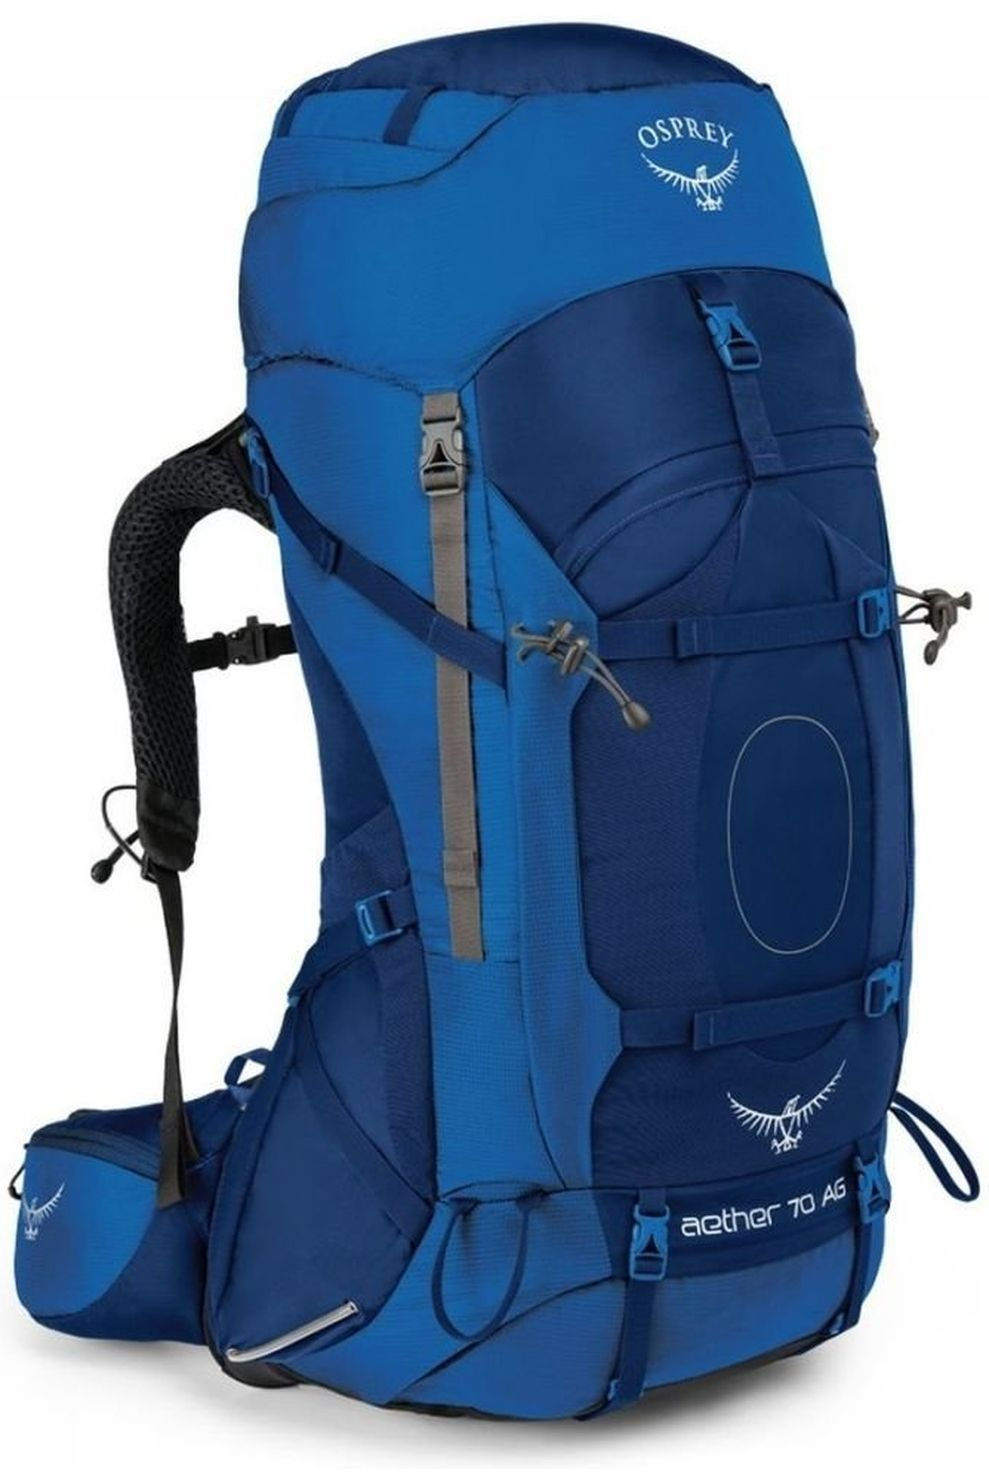 Osprey Rugzak Aether AG 70 voor heren - Blauw - Maten: M, L